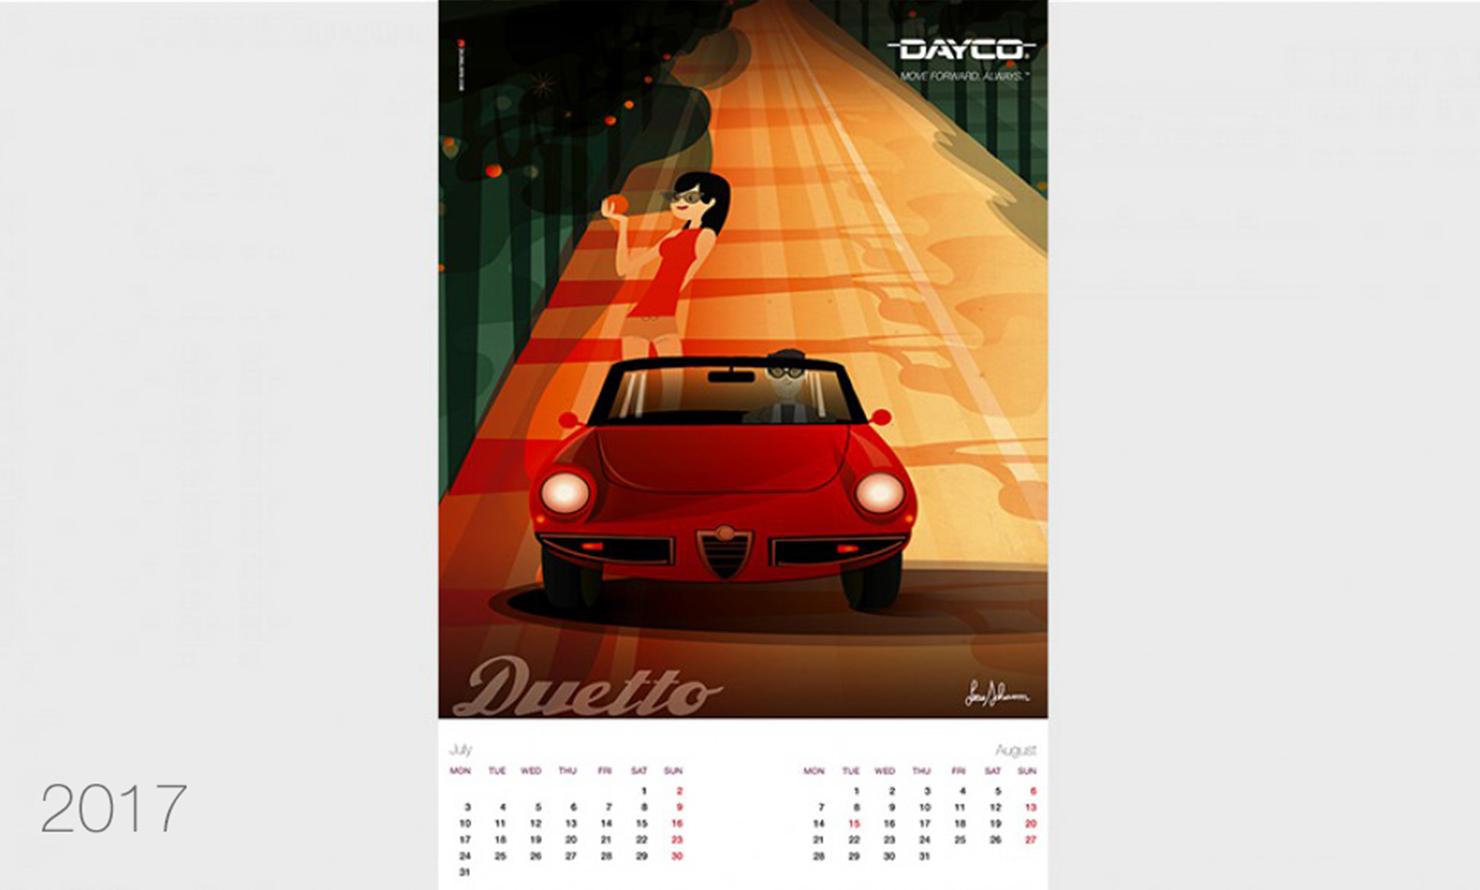 https://kubelibre.com/uploads/Slider-work-tutti-clienti/dayco-calendario-2017-4.jpg